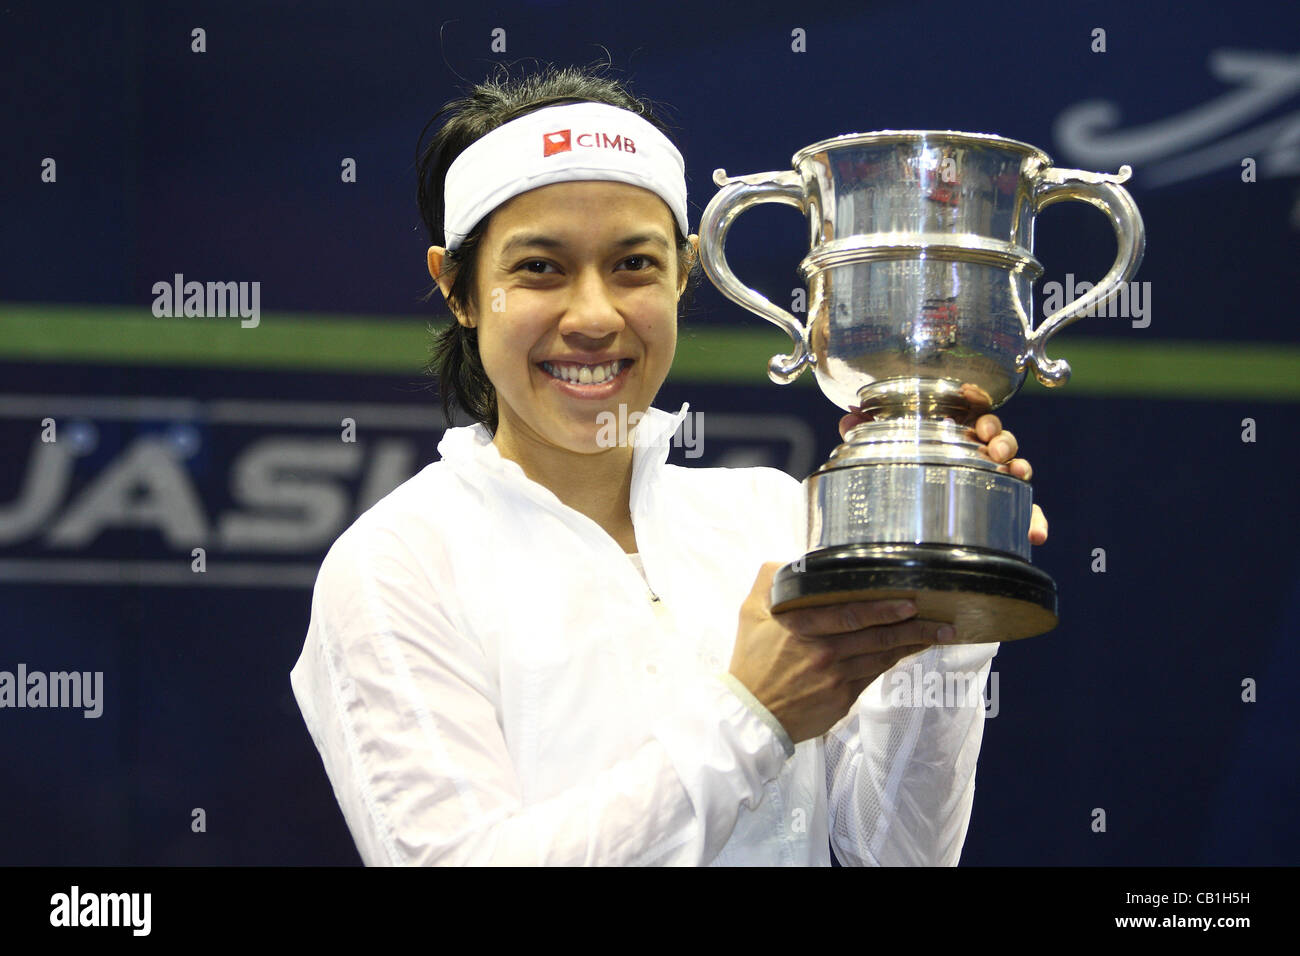 London, England. 20/05/2012. British Open Squash Championships. The winner of the women's British Open Final - Stock Image